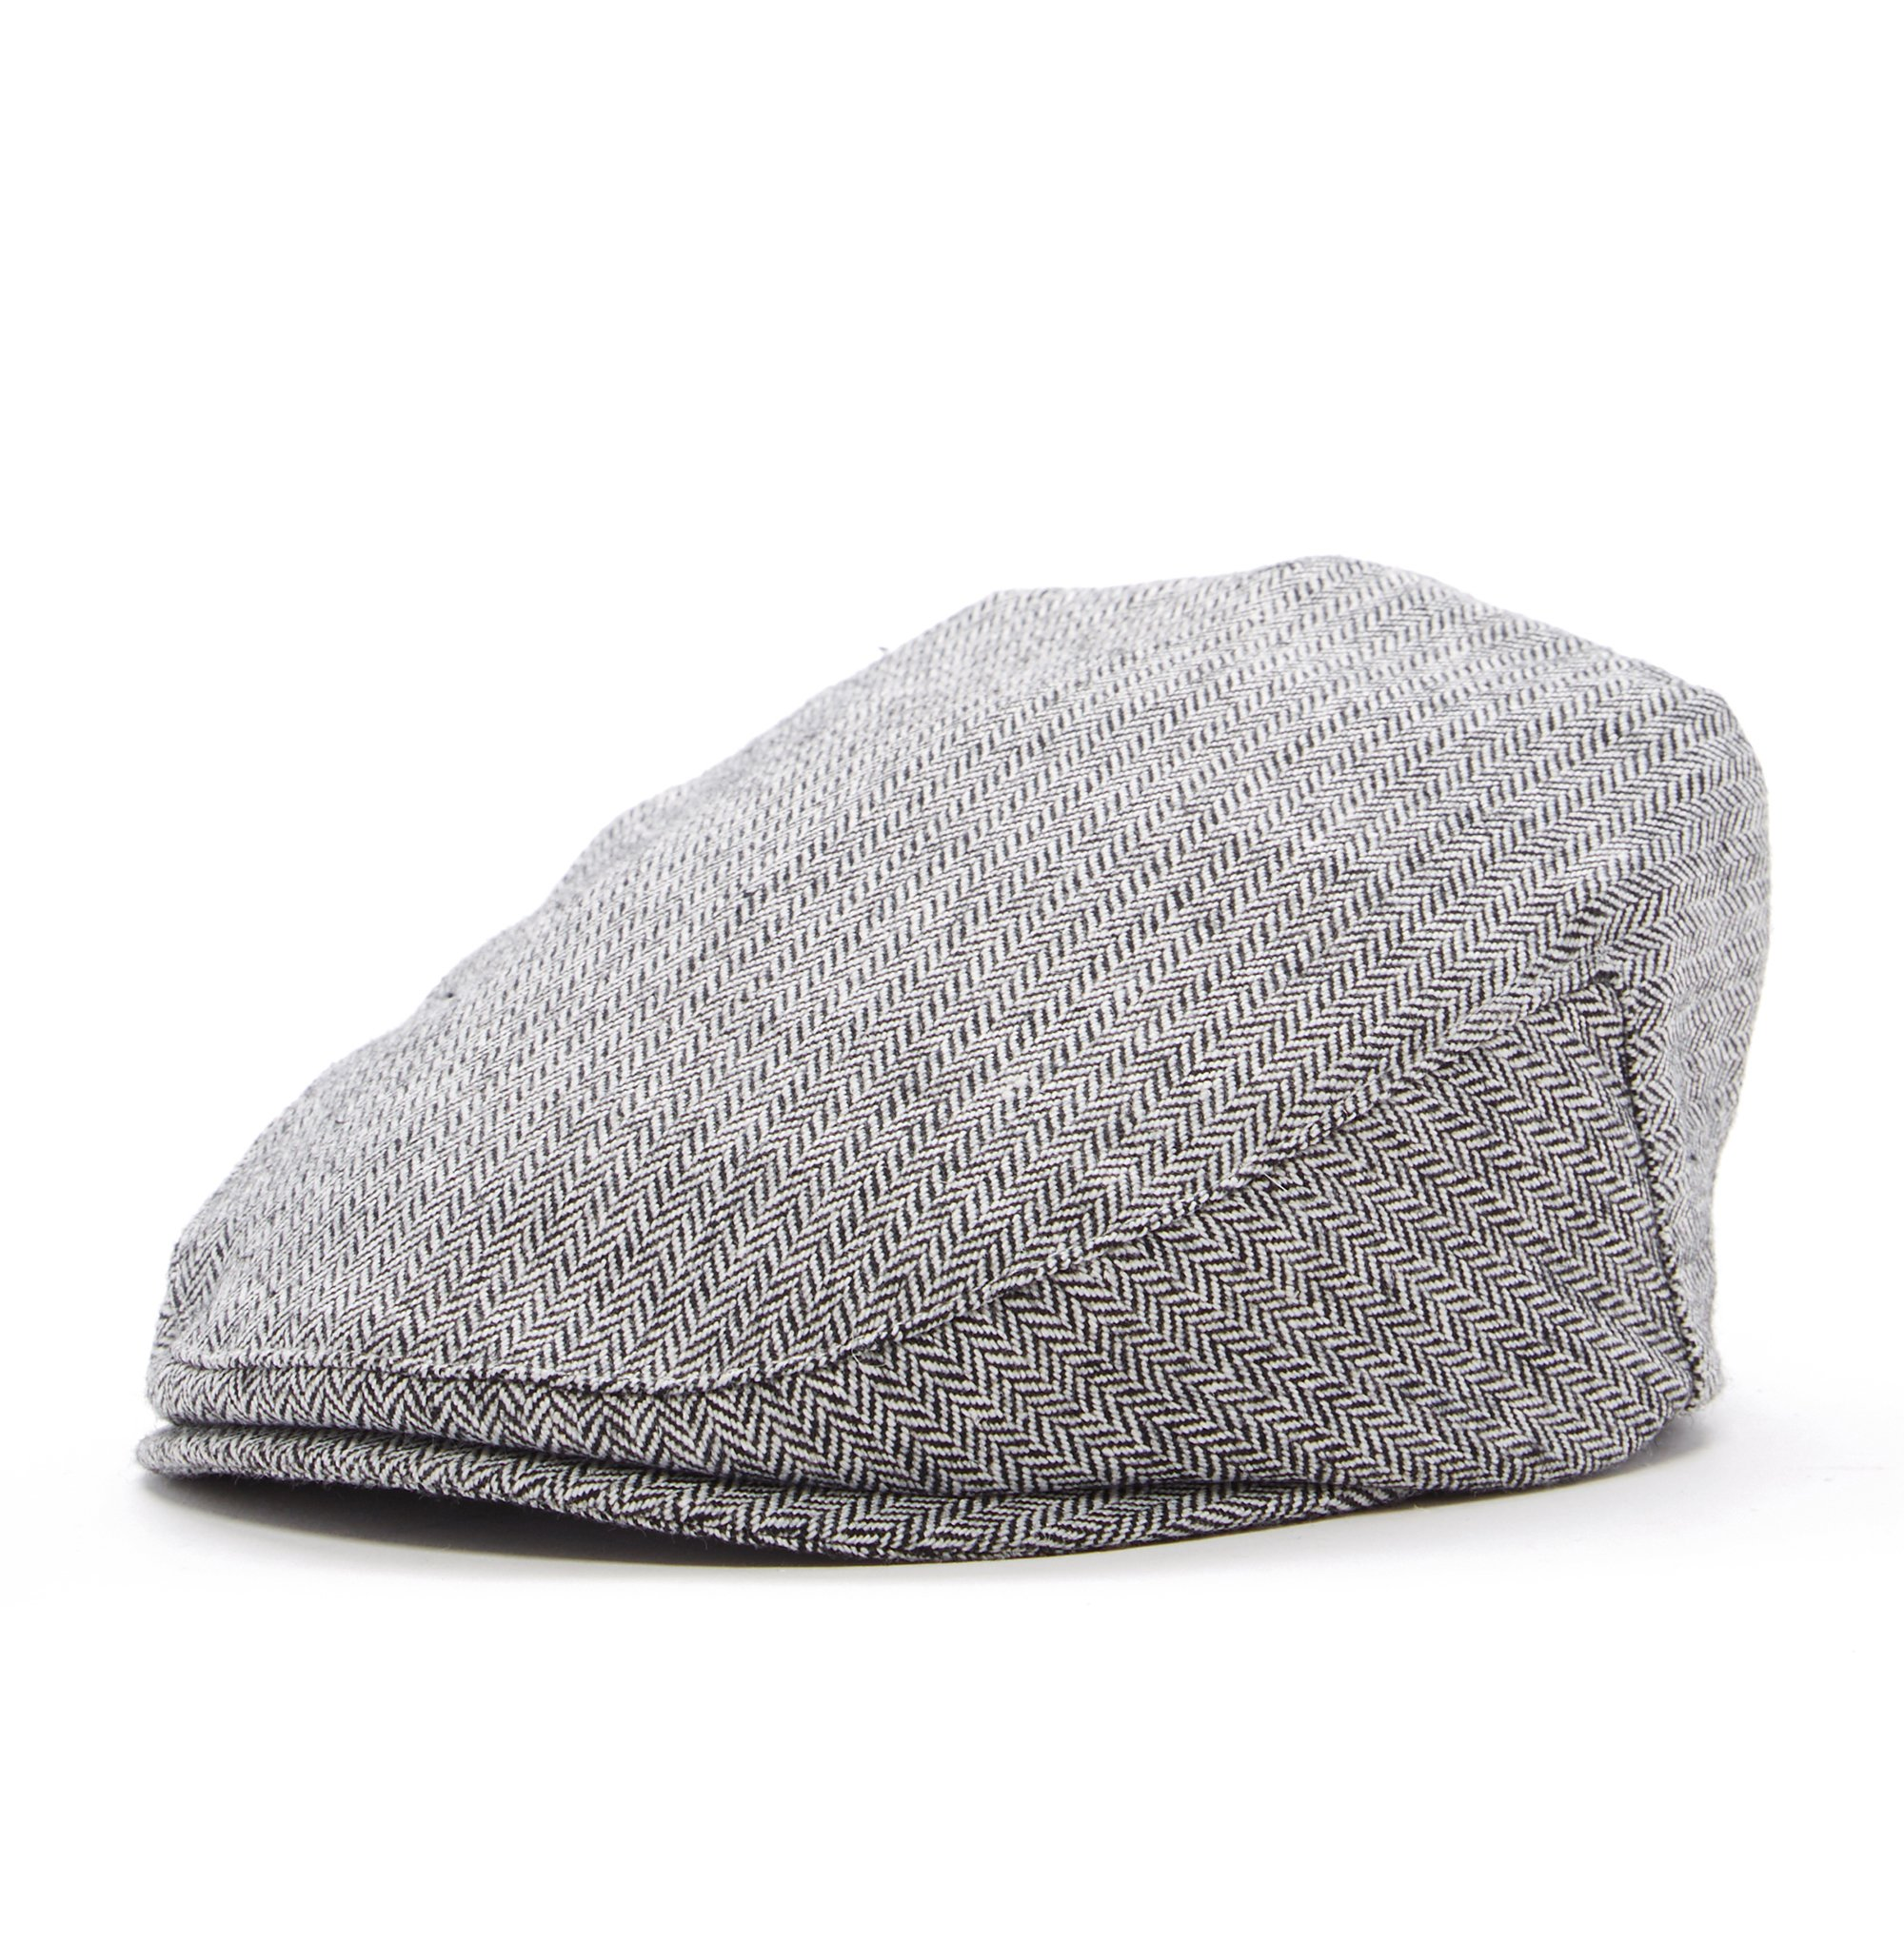 Born to Love - Boy's Tweed Page Boy Newsboy Baby Kids Driver Cap Hat (XXS 46CM), Grey Black by Born to Love